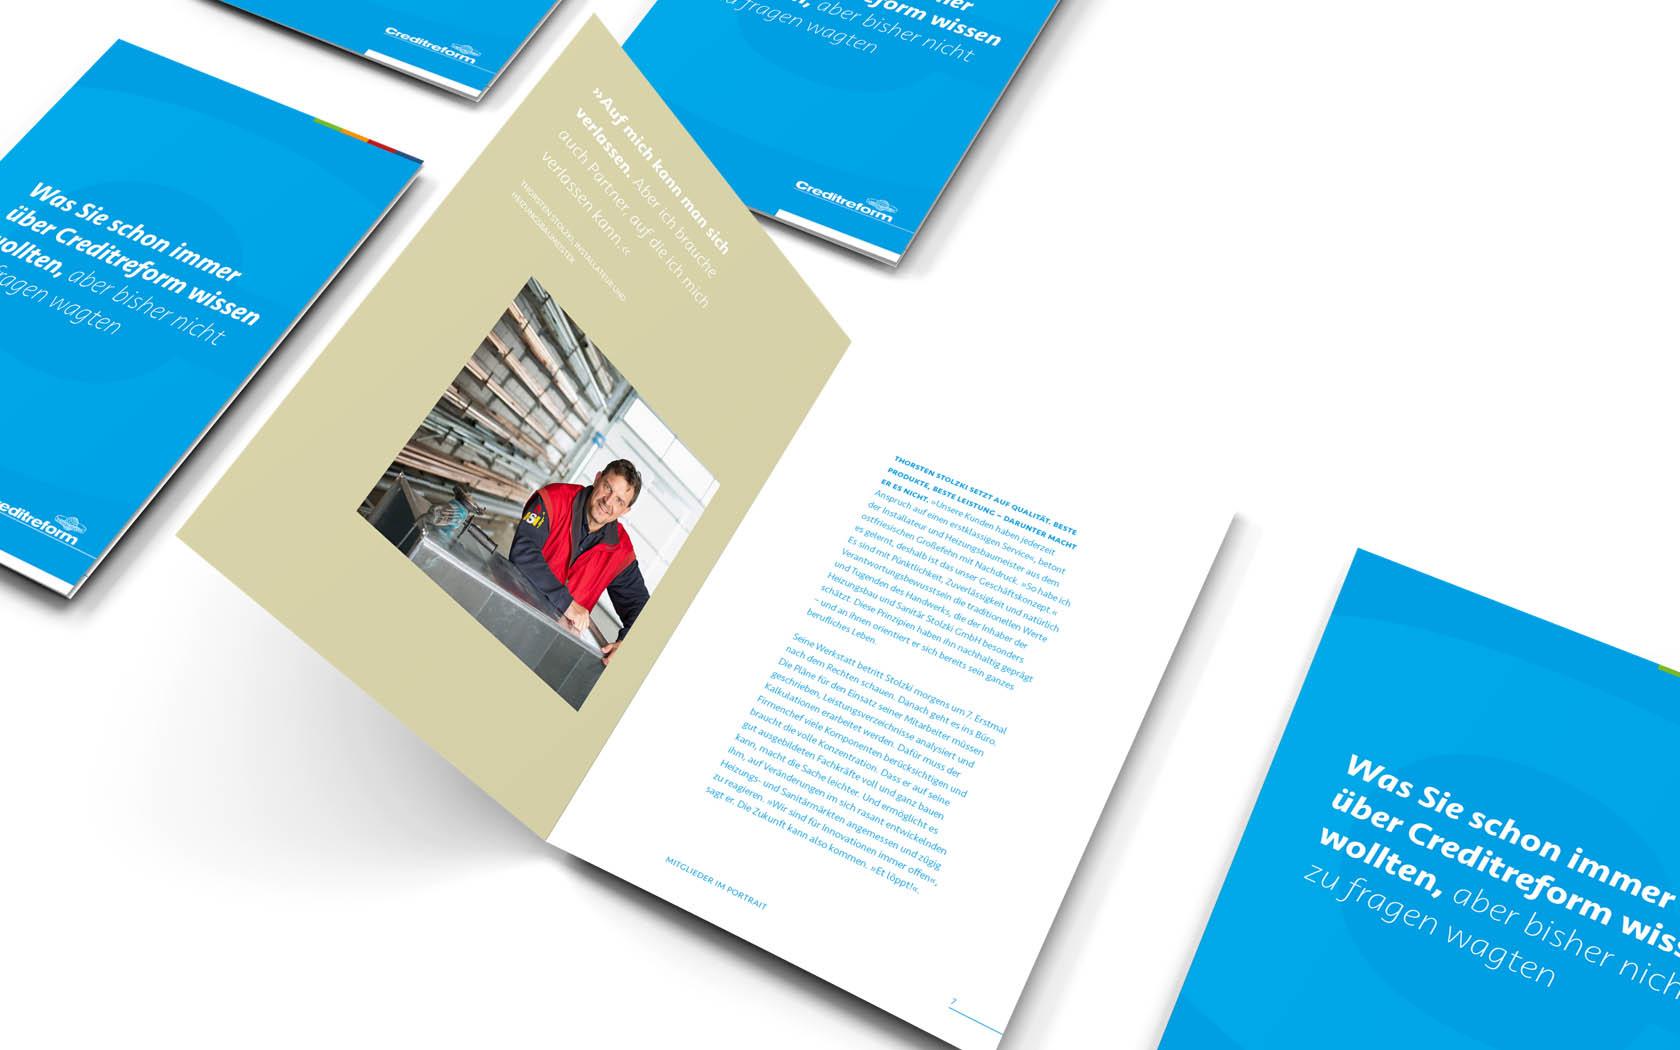 Imagebroschüre im Rahmen des Corporate Designs